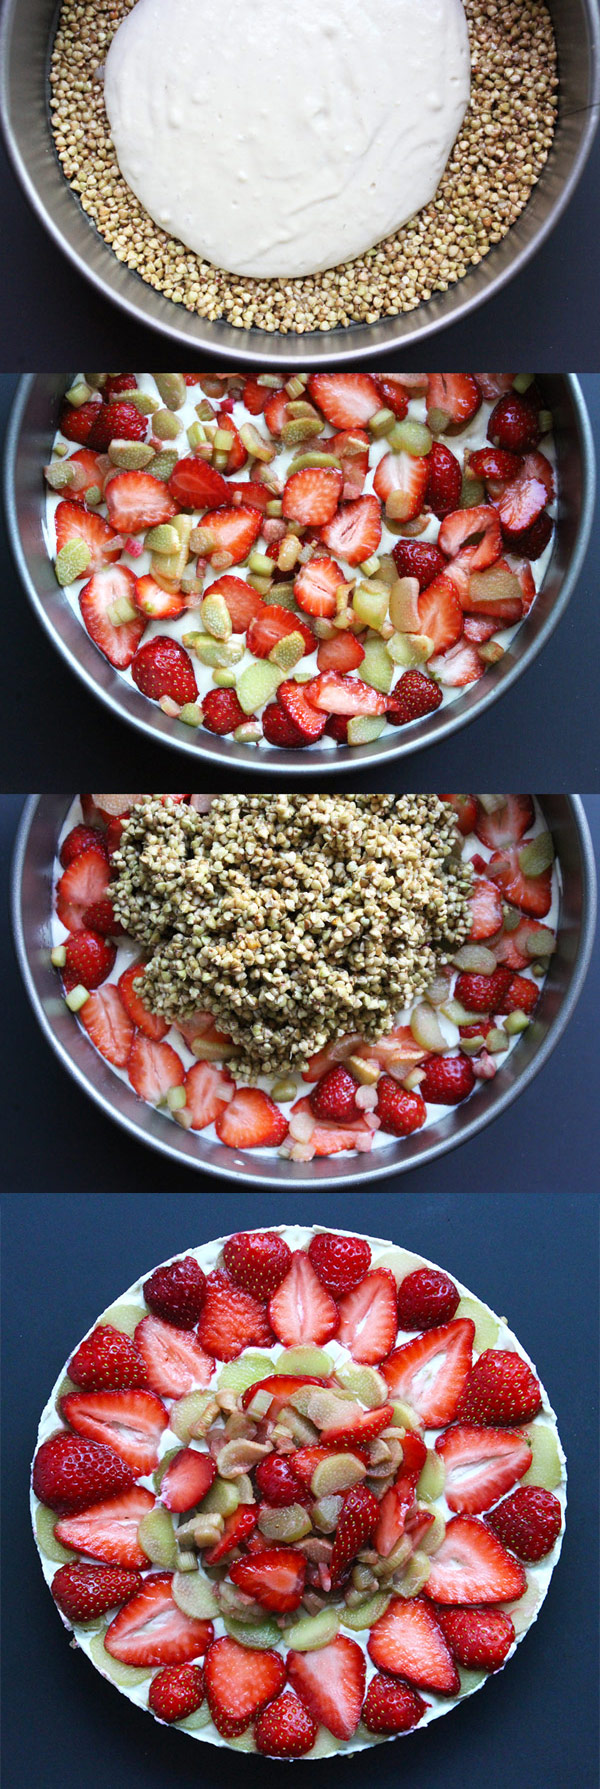 Strawberry Rhubarb Crispy Cream Cake